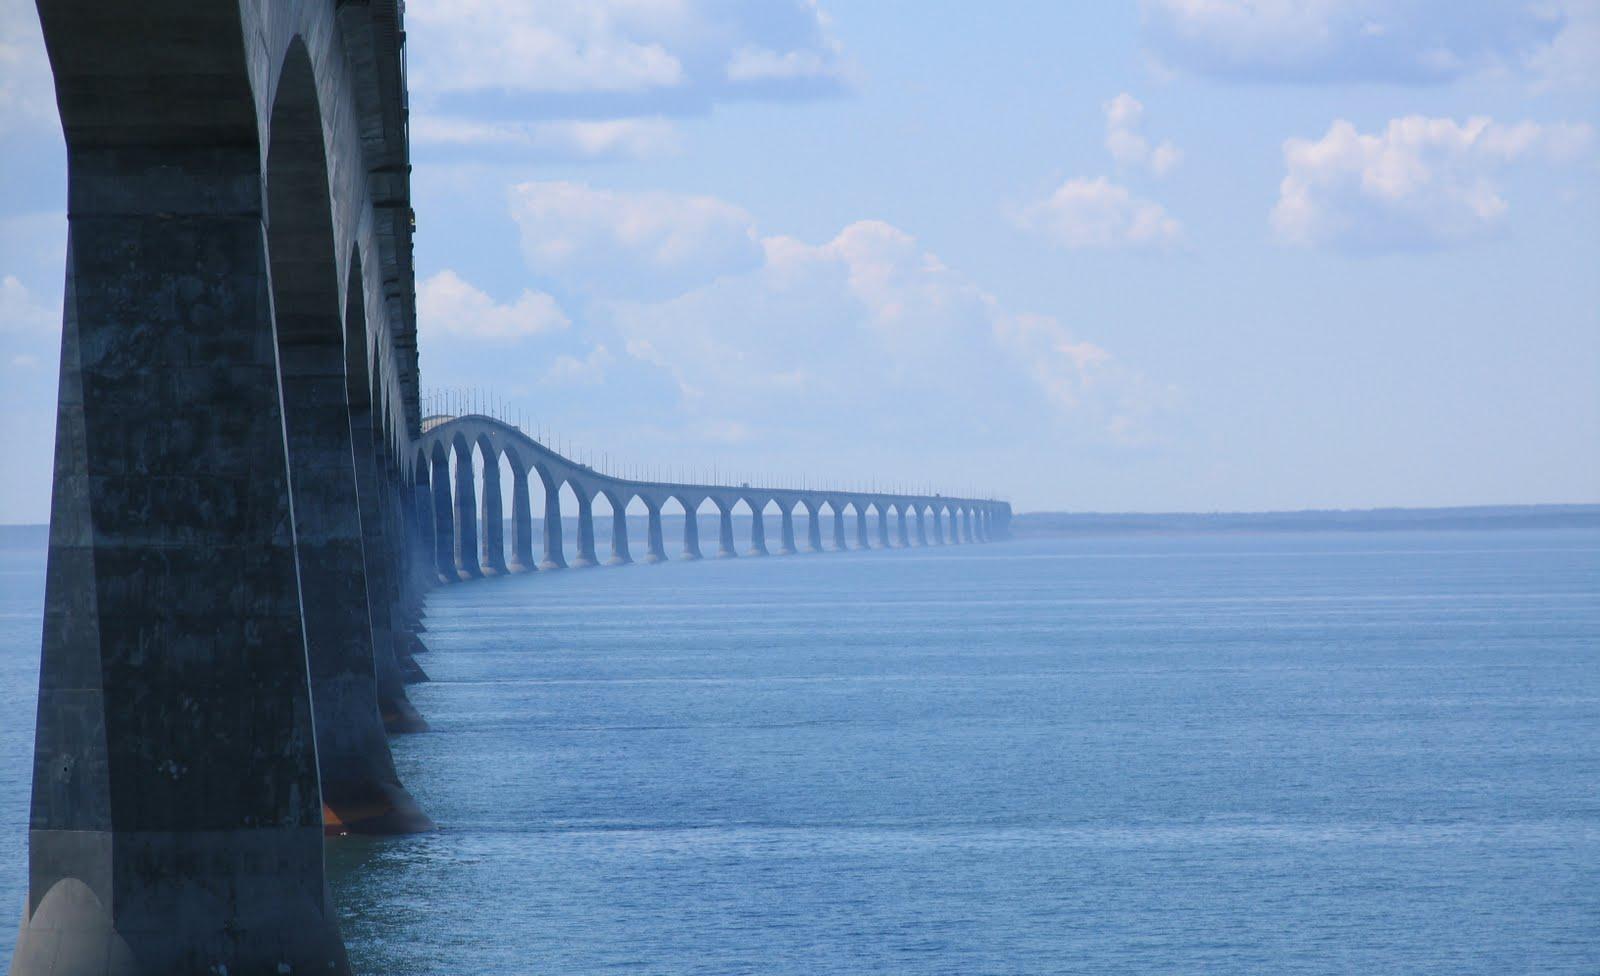 Longest Bridge In The World Over Water The world over icy water Longest Bridge In The World Over Water